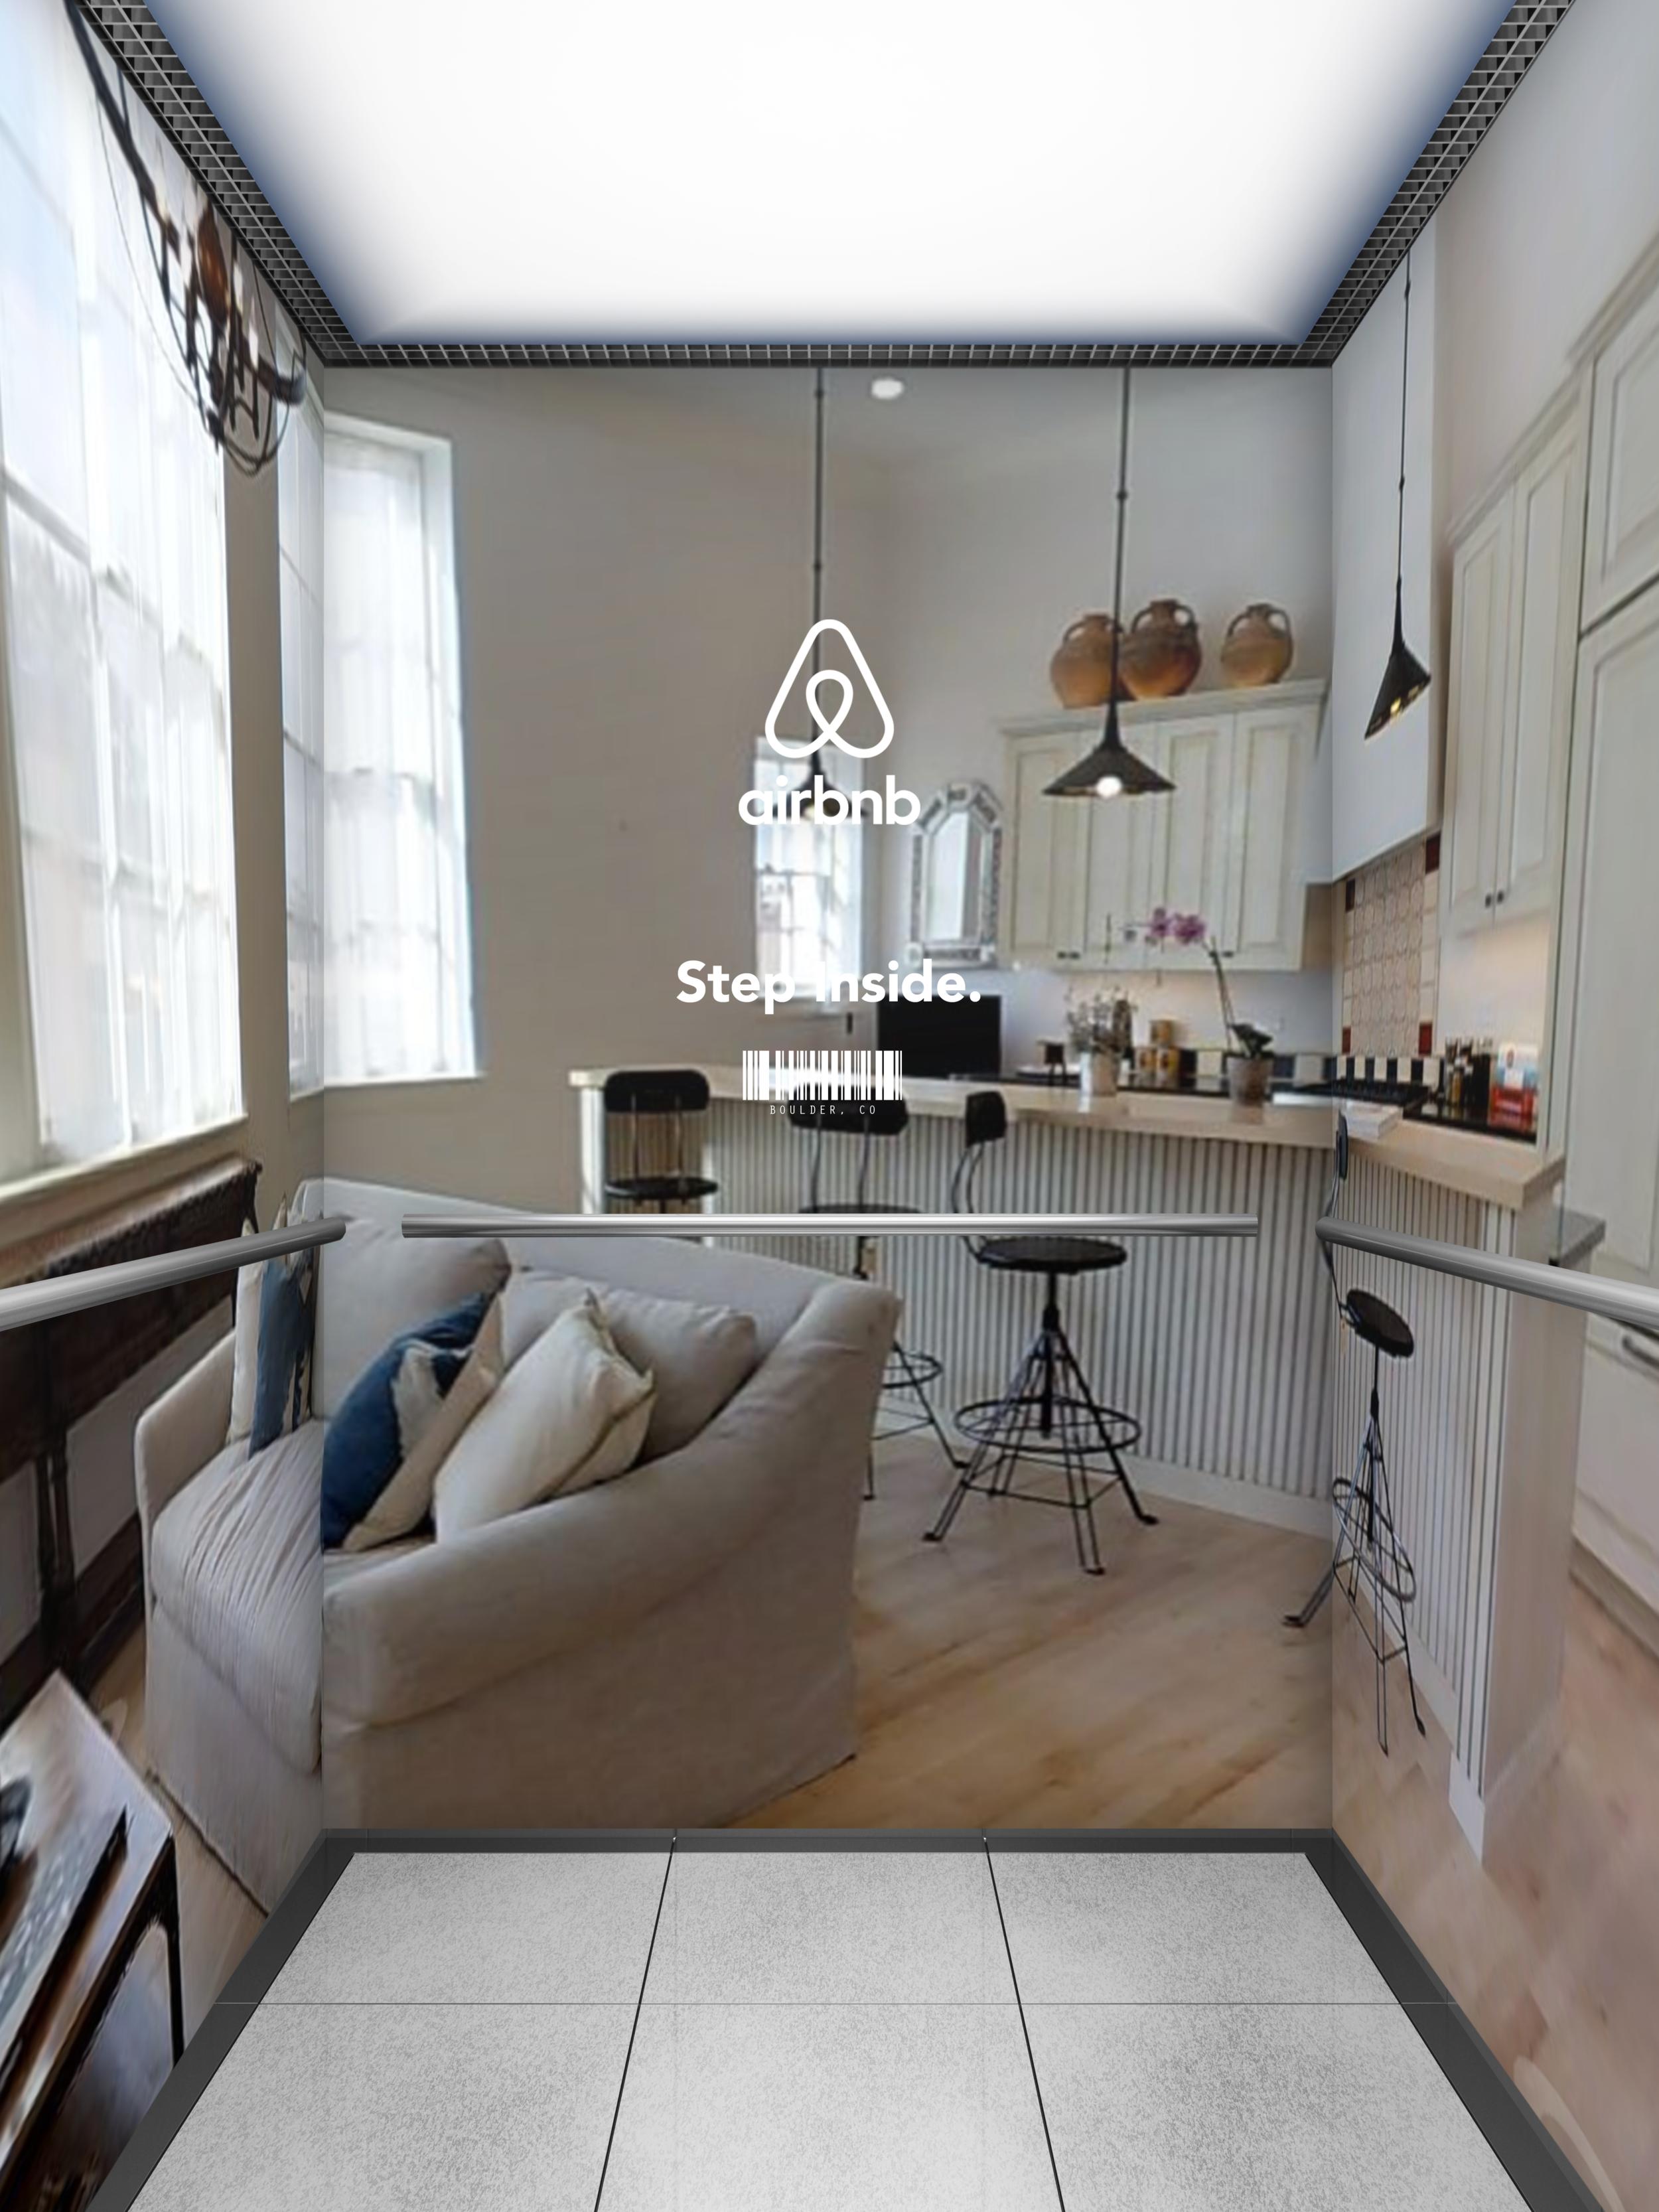 Airbnb Inside Mockup2.png